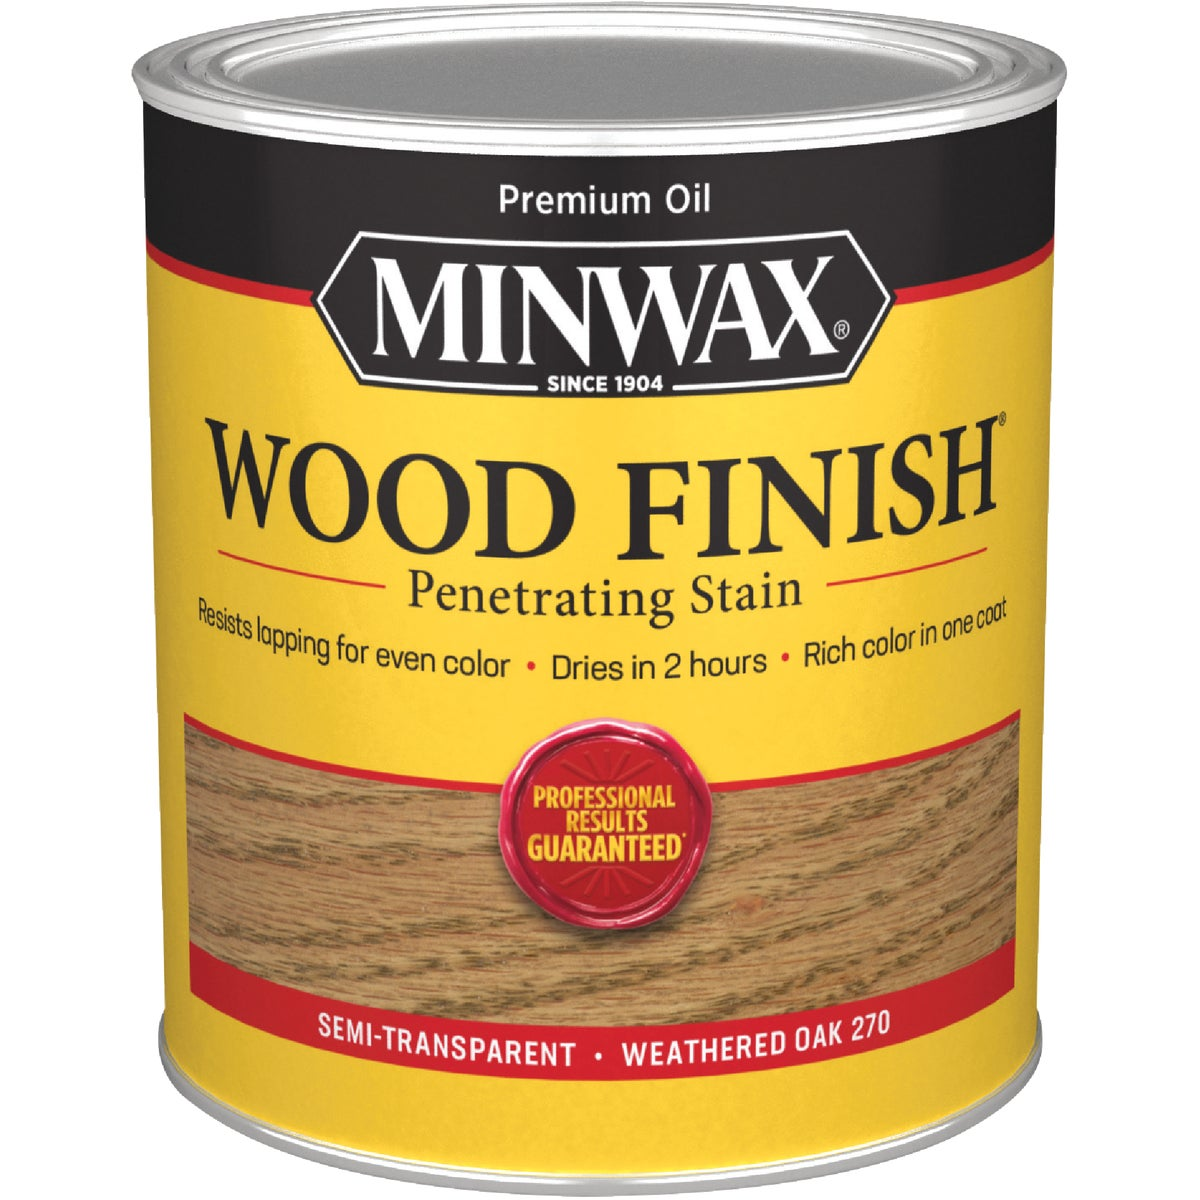 WEATHERED OAK WOOD STAIN - 700474444 by Minwax Company